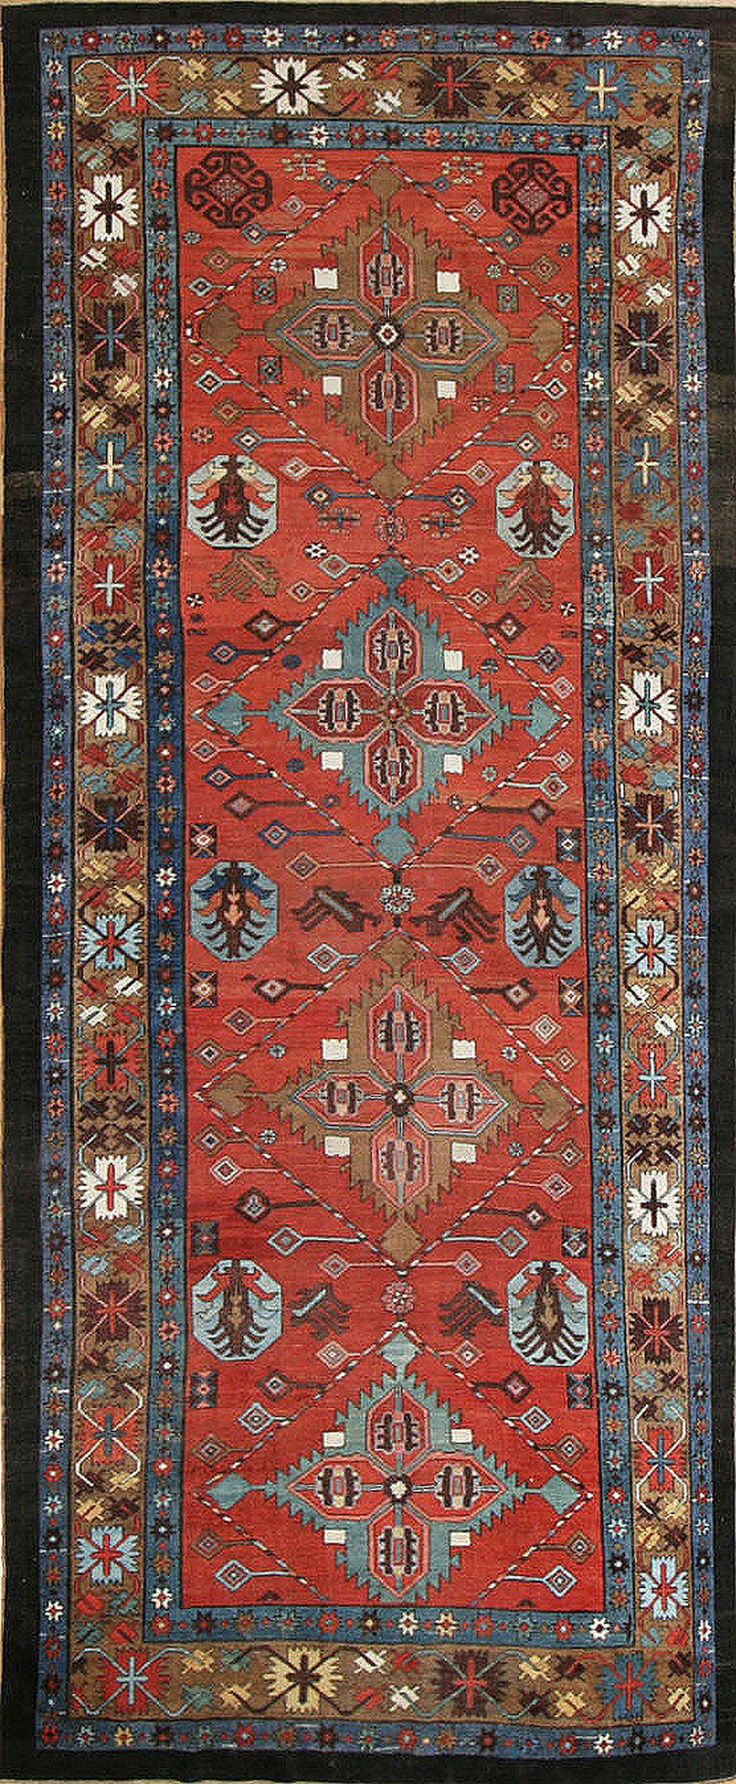 traditional rug patterns antique bakshaish rug, persia, late 19th century NNVNEGM